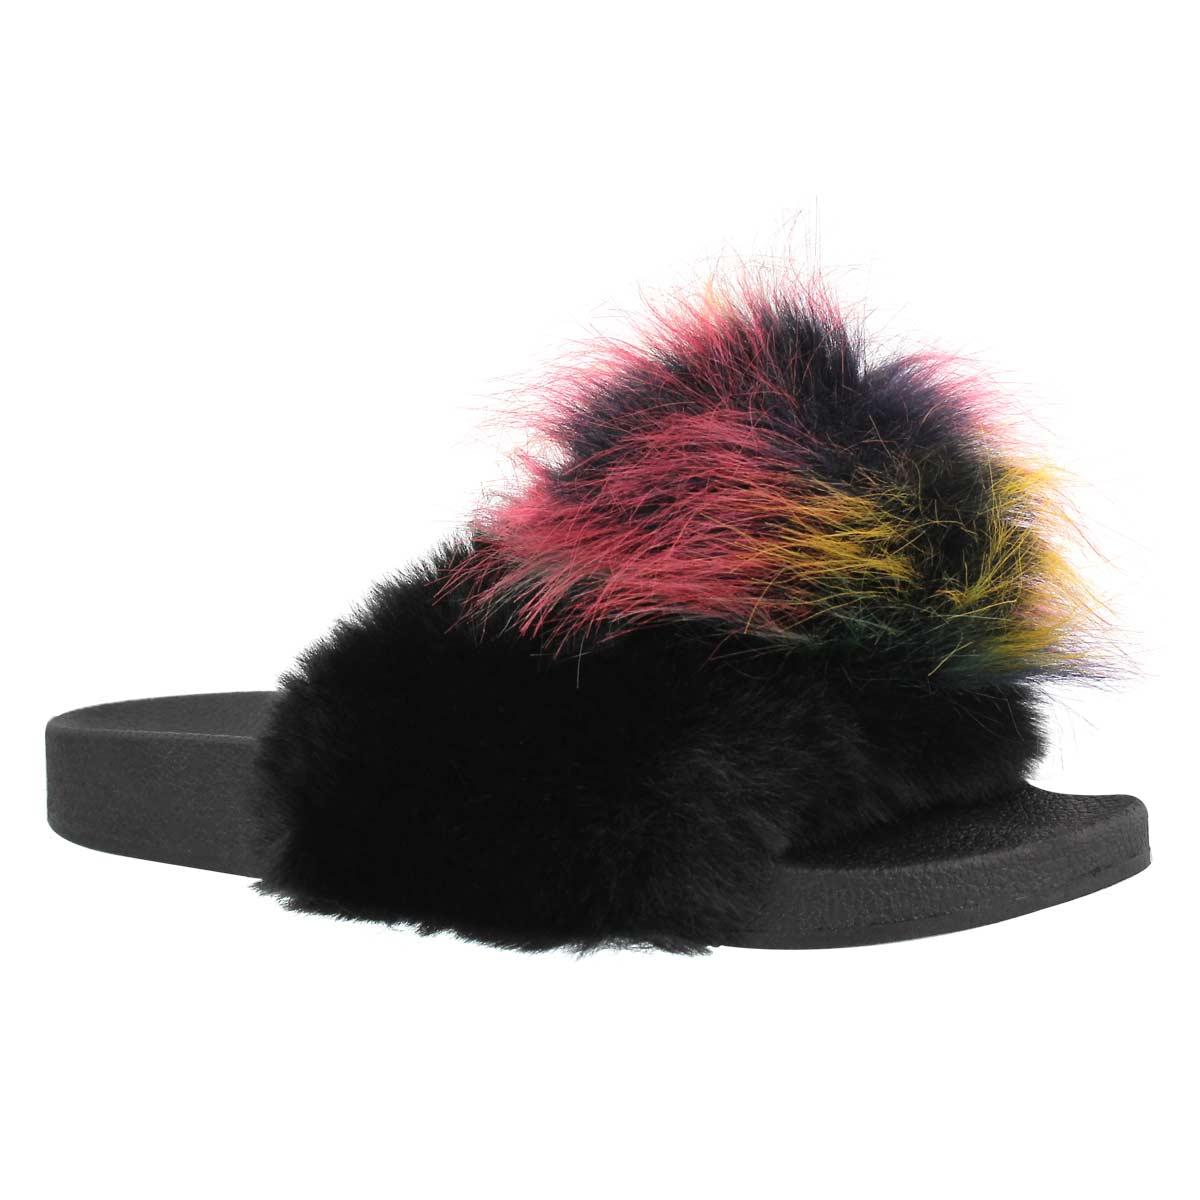 Women's SPIRAL black multi fur slide sandals